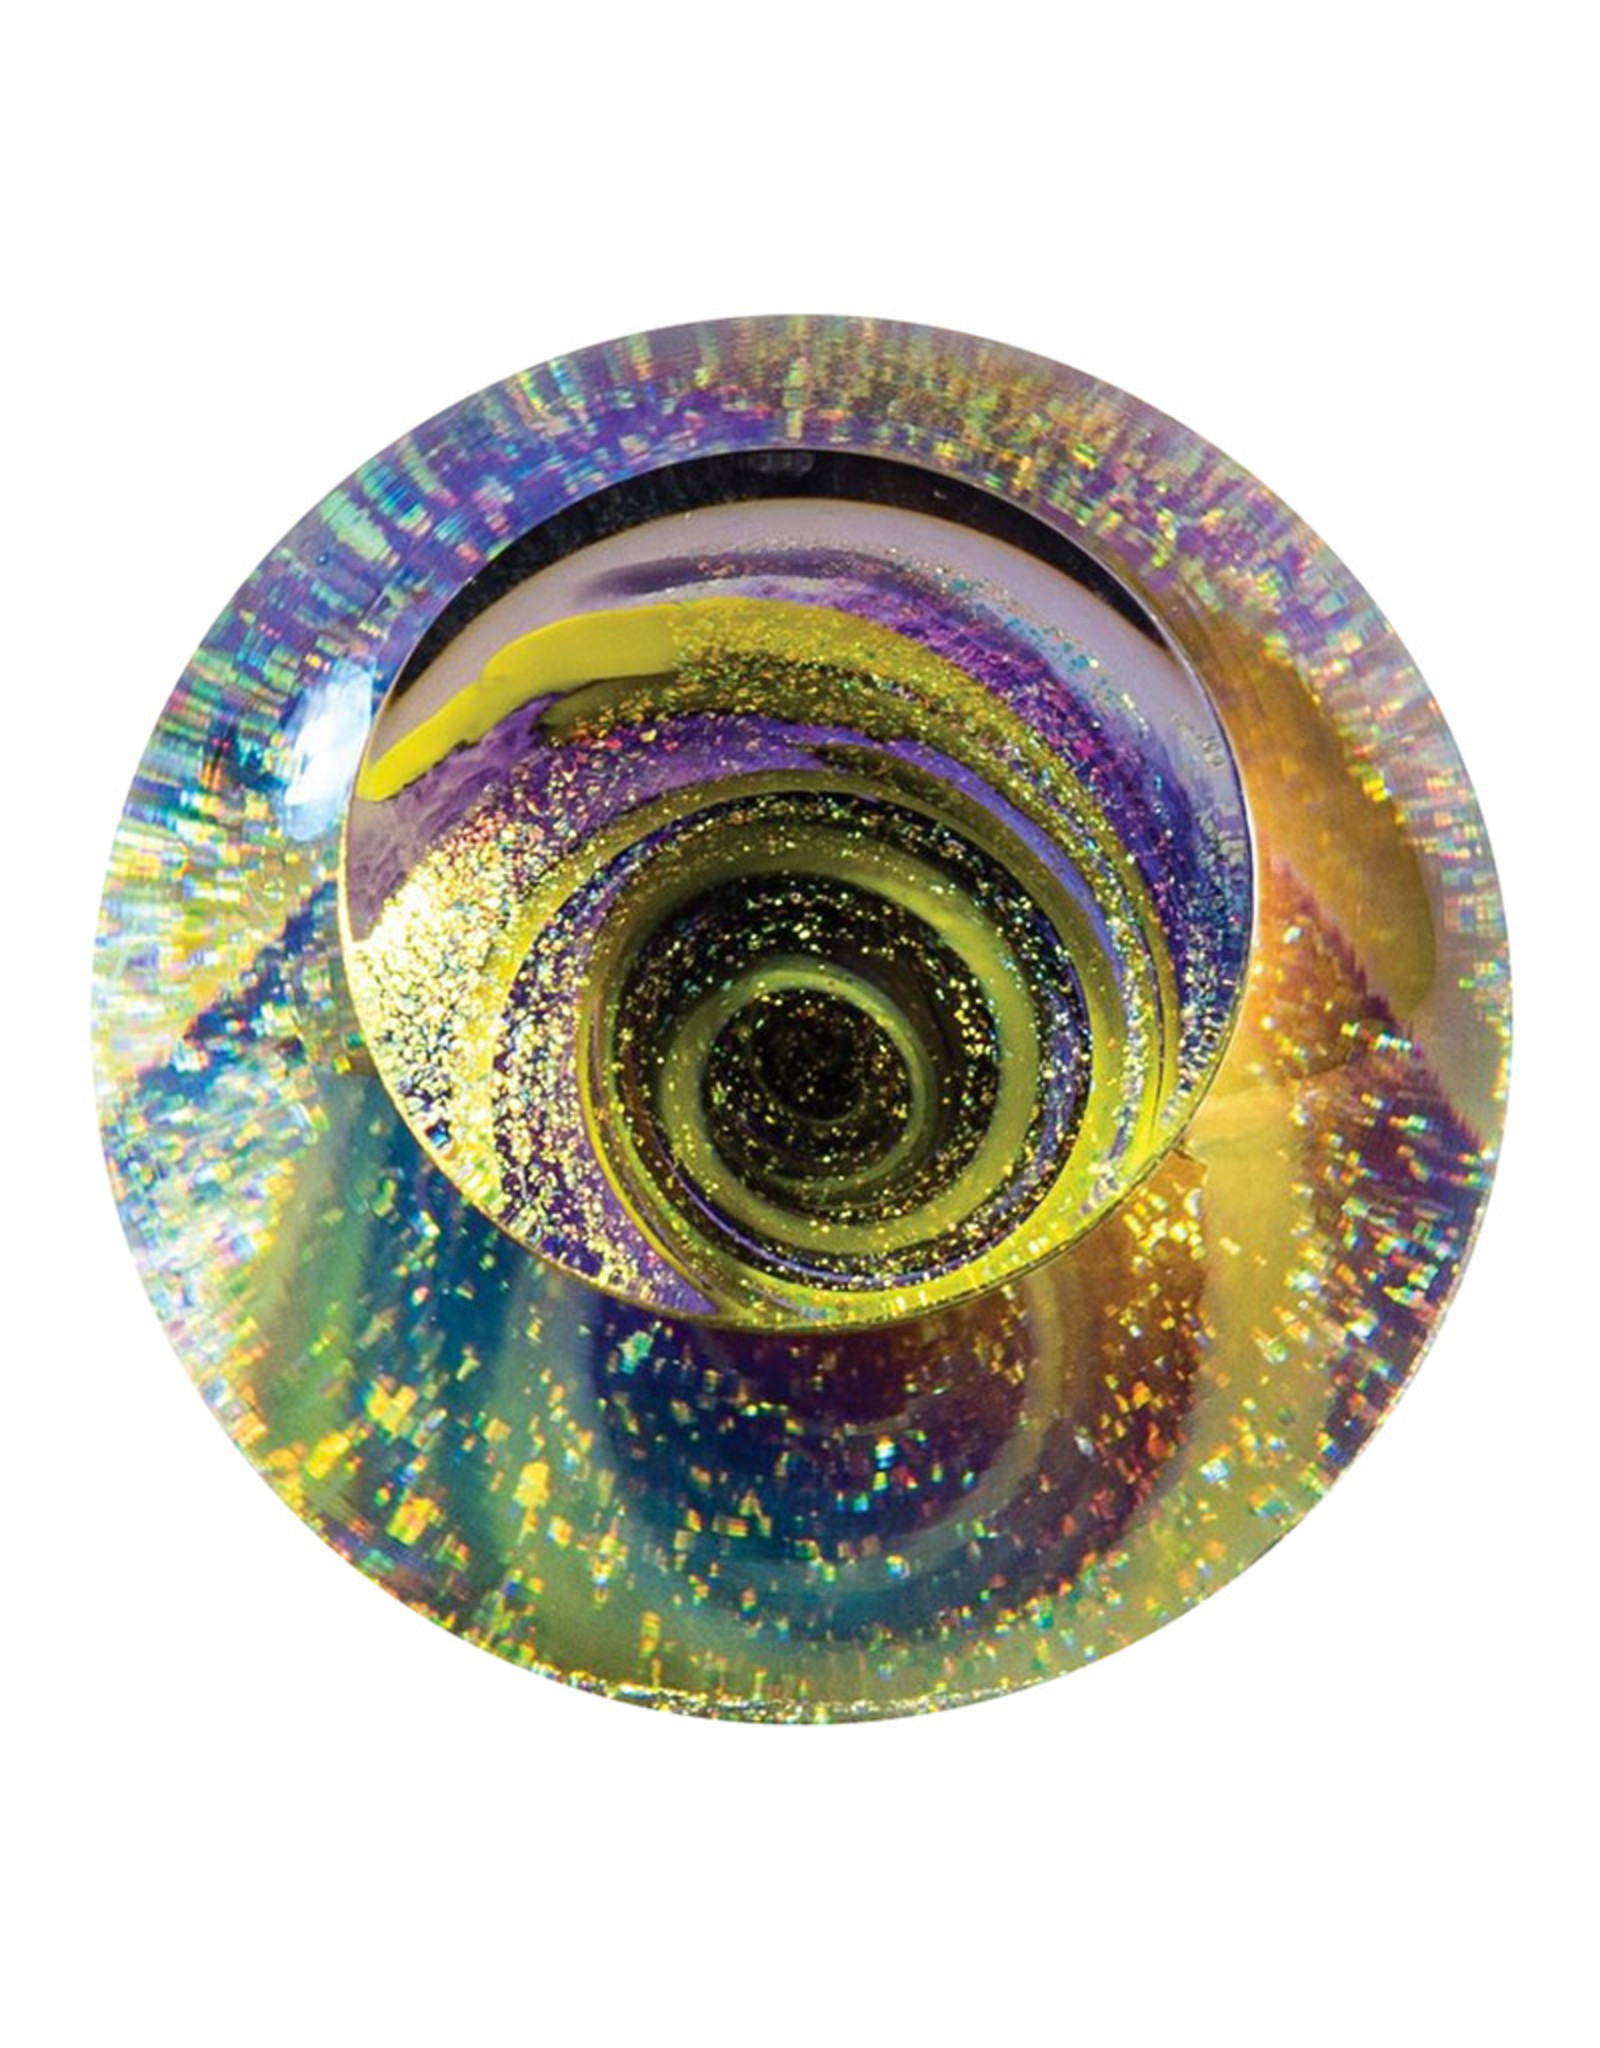 GLASS EYE AVENTURINE FIREBALL PAPERWEIGHT